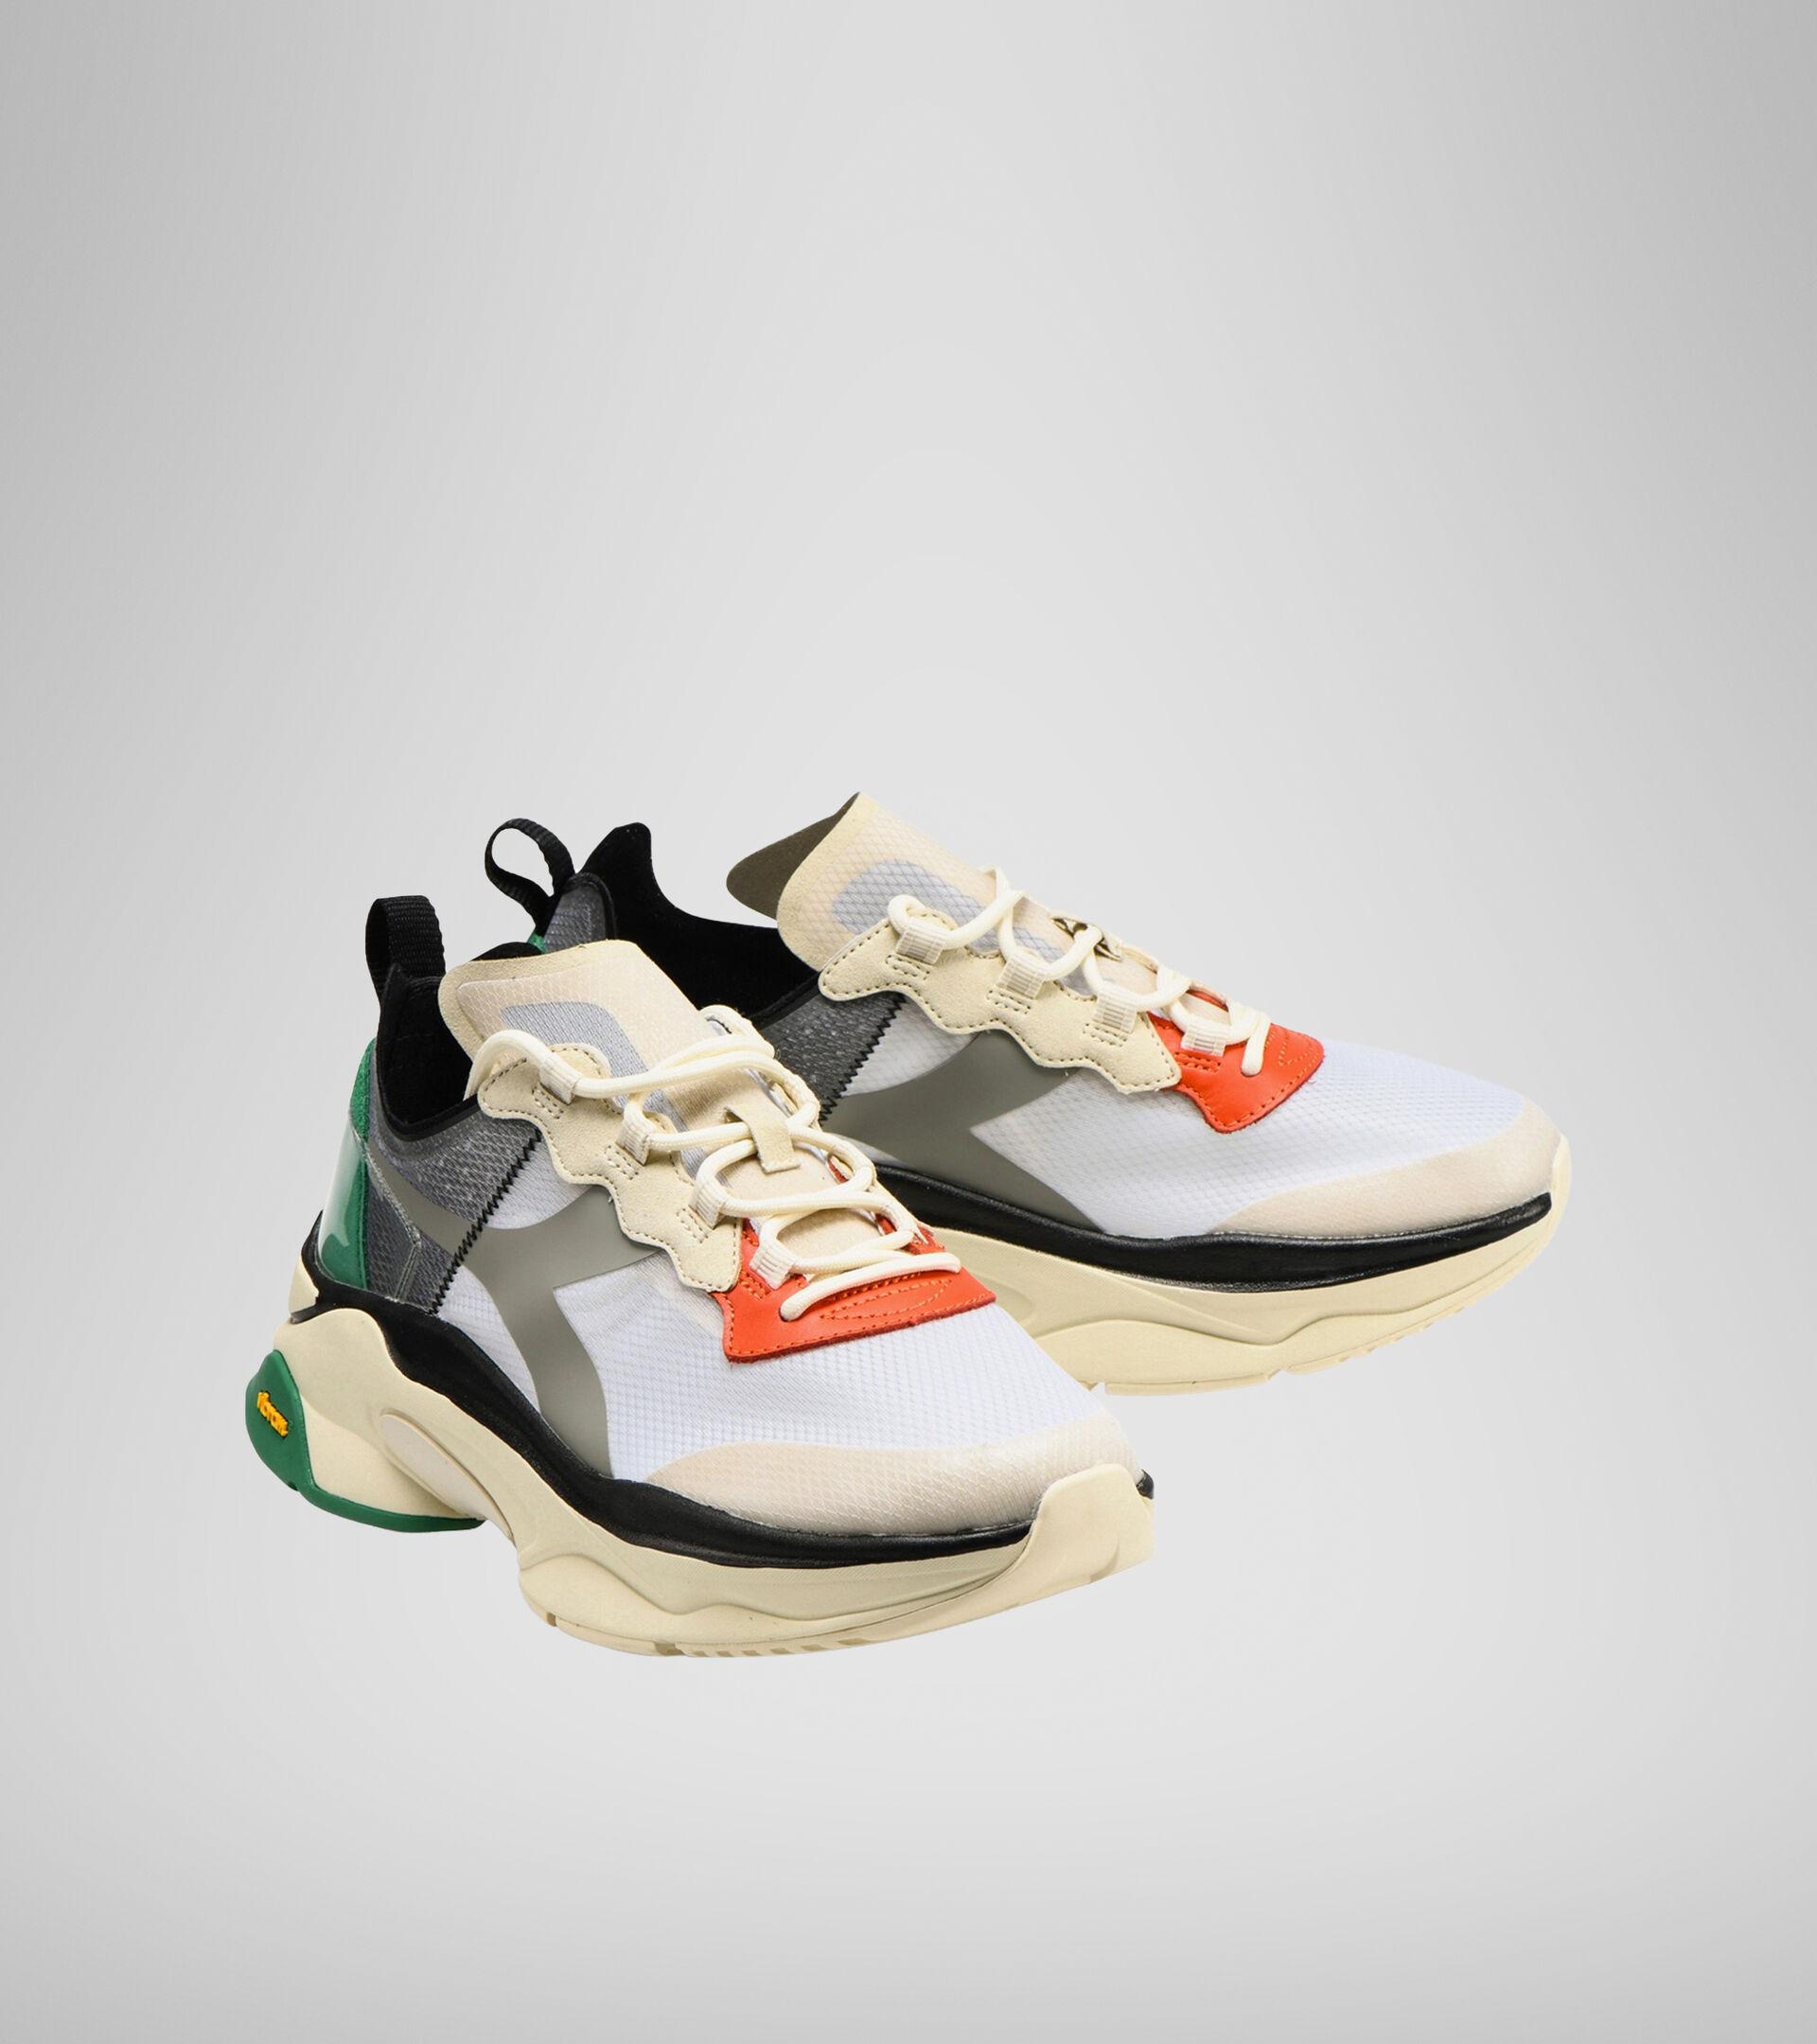 Footwear Sportswear UNISEX TERRENA LIGHT ANGORA BEIGE Diadora